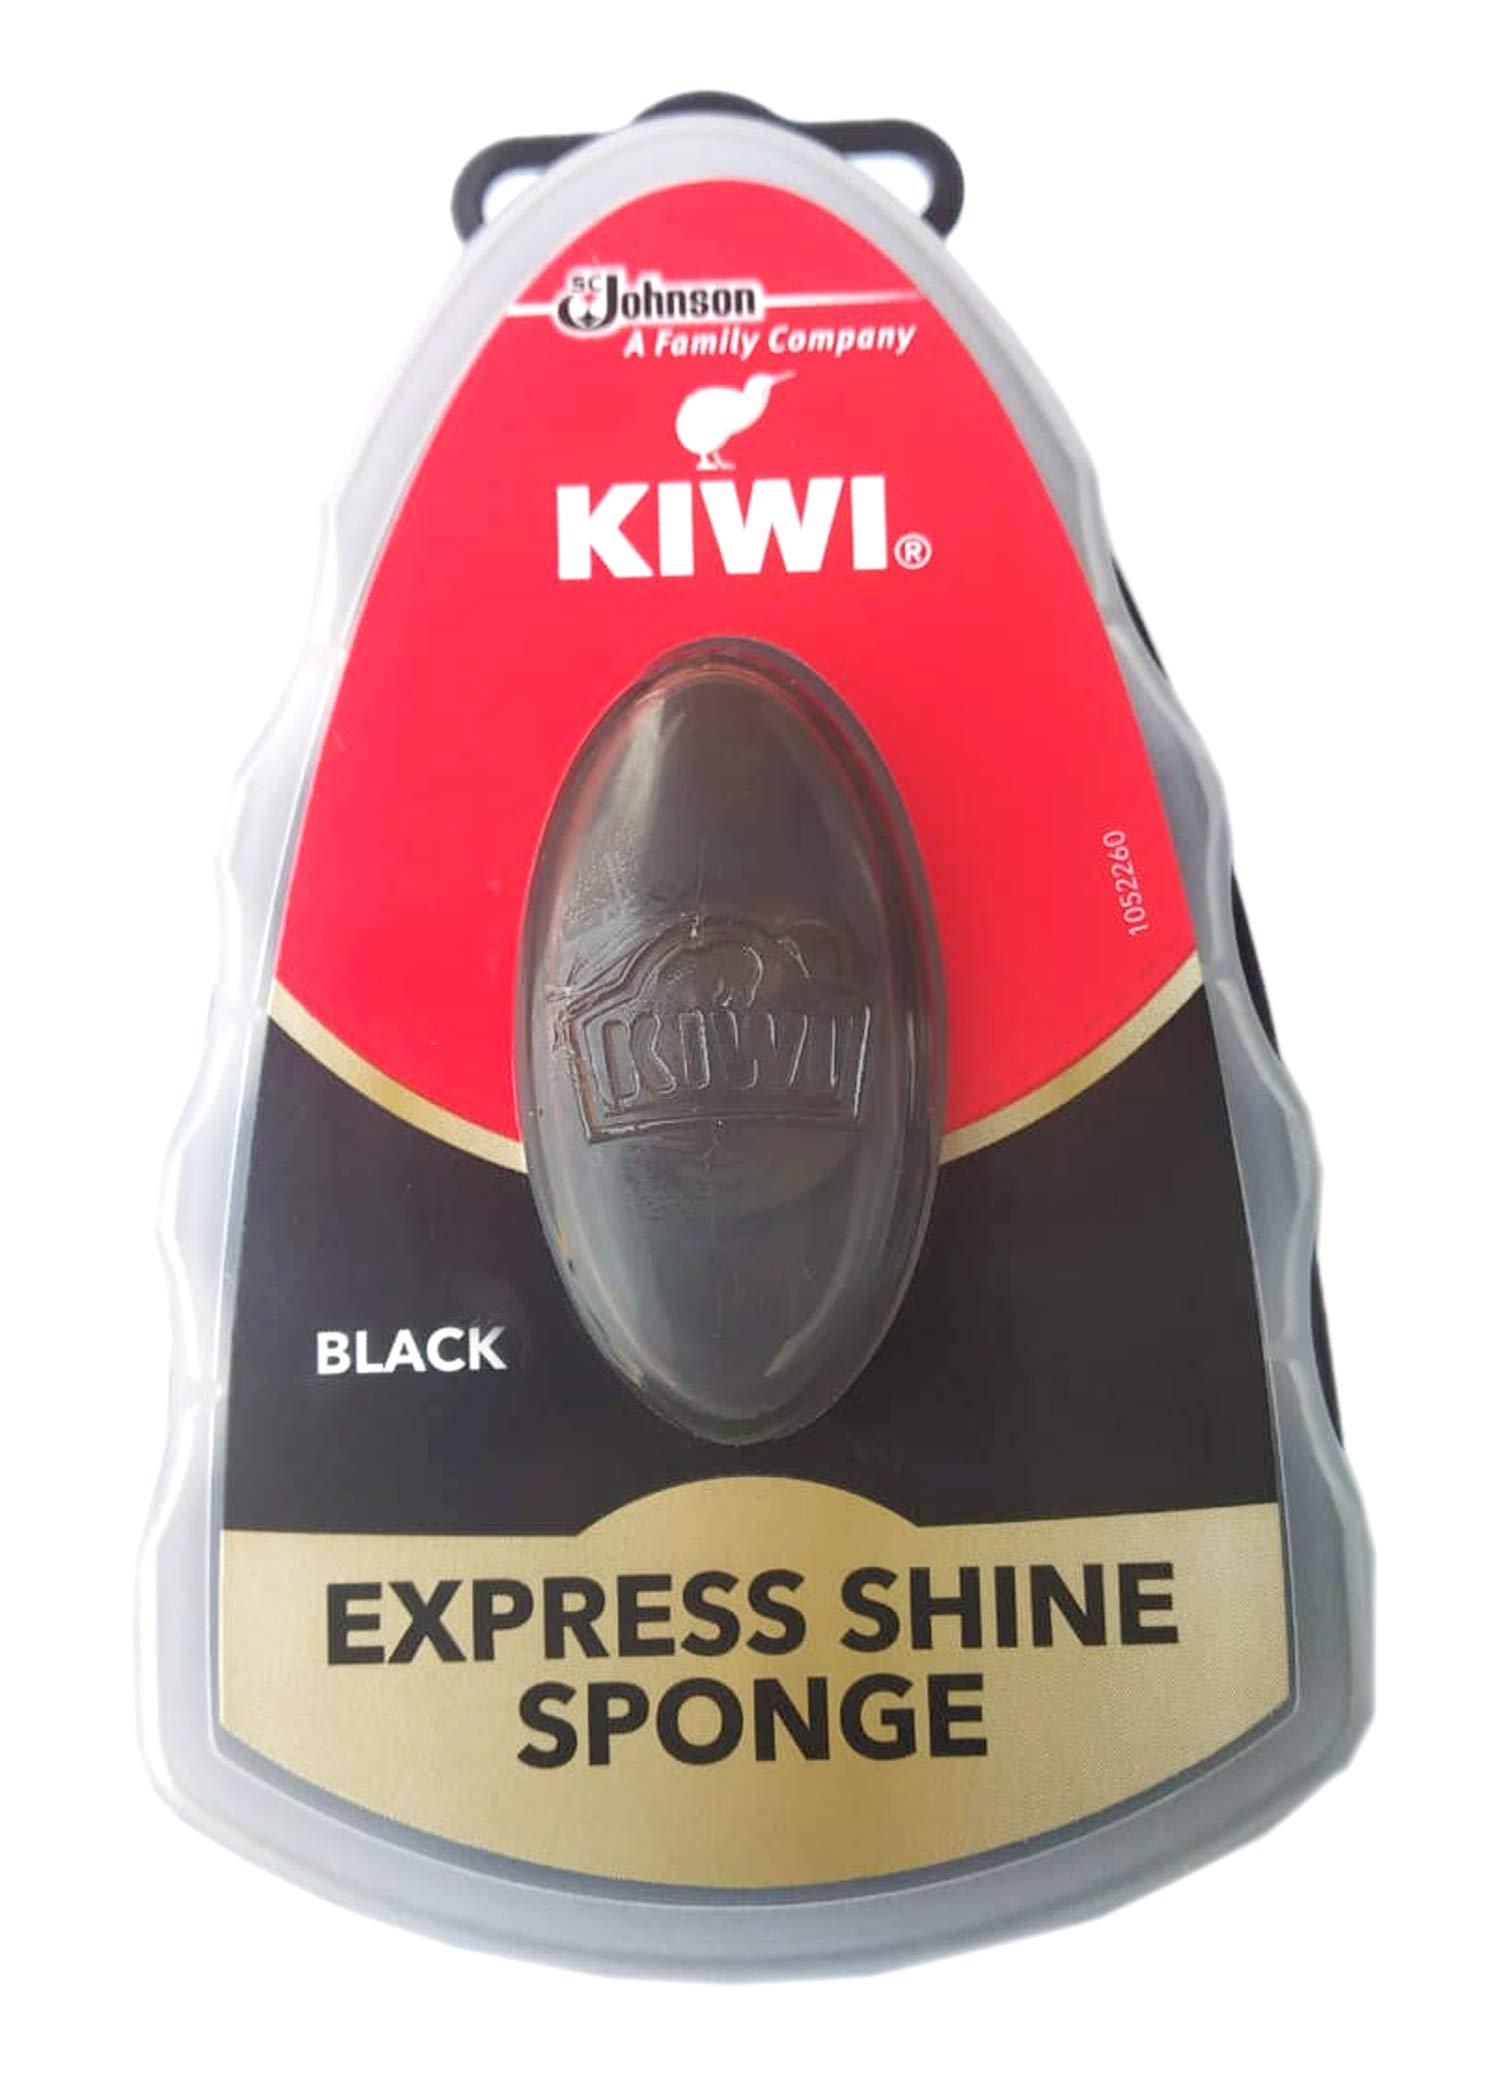 Kiwi Express Shoe Shine Sponge, 0.2 fl oz, Black